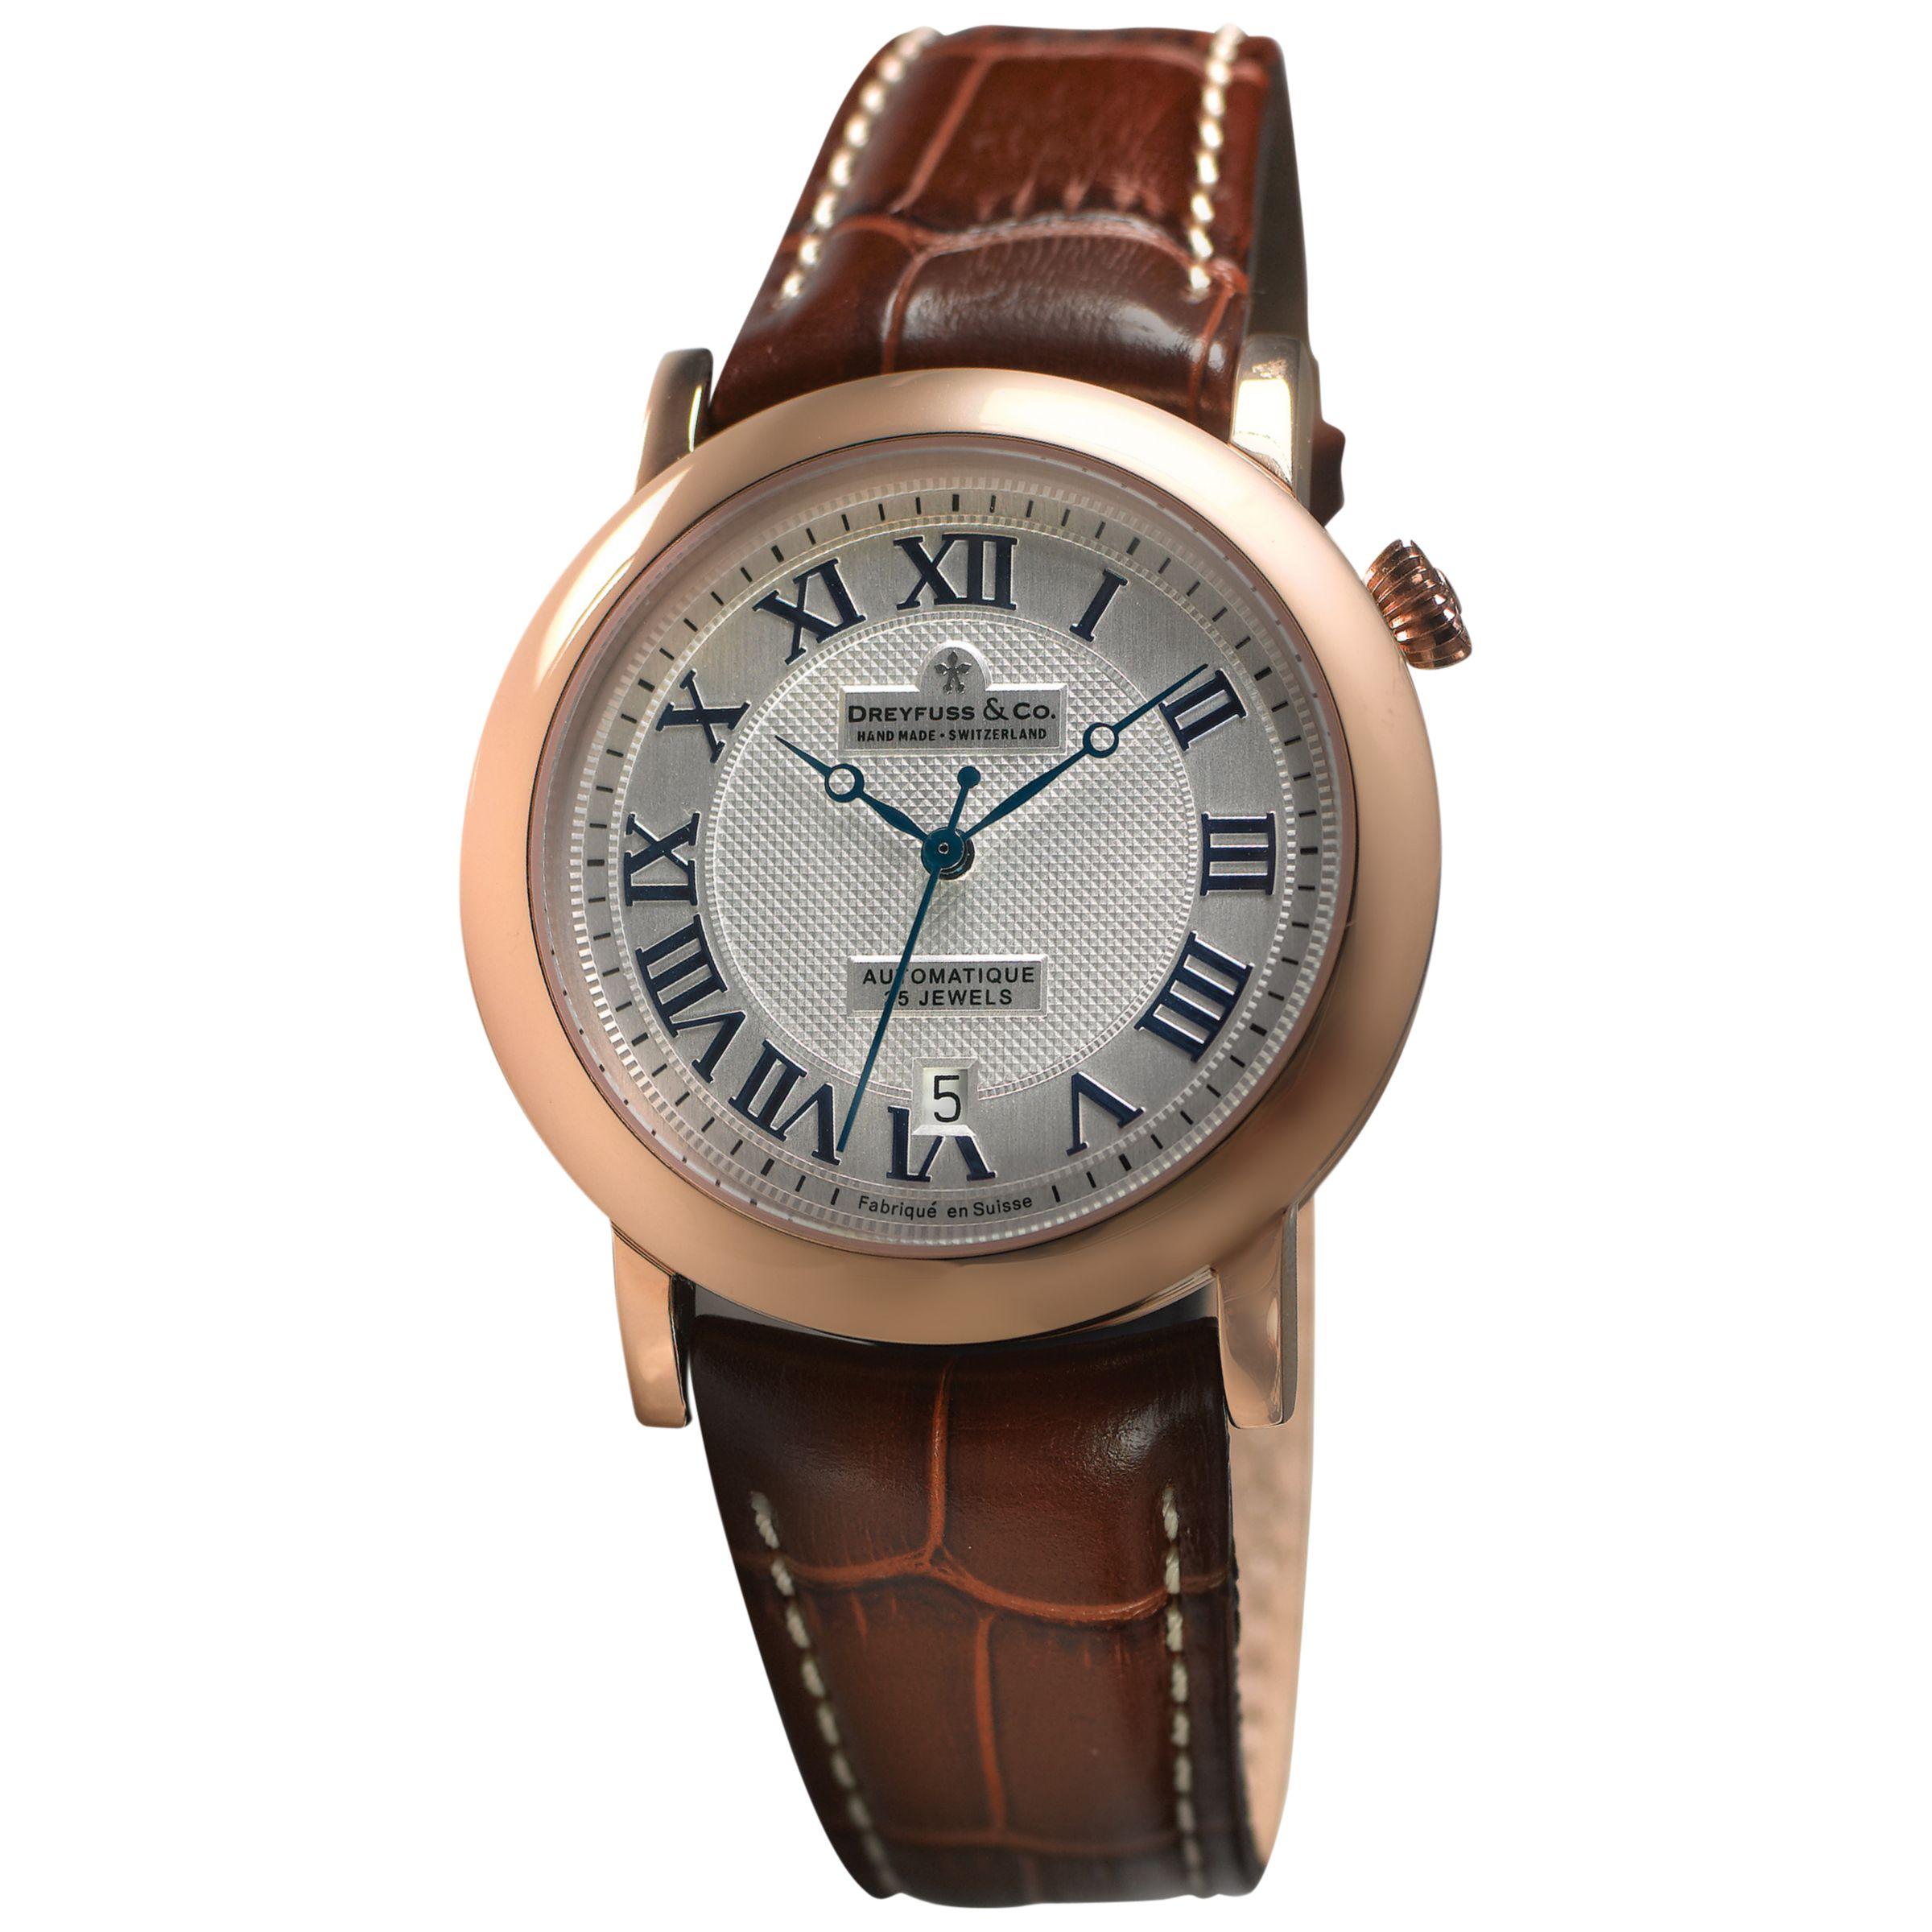 Dreyfuss & Co Dreyfuss & Co DGS00031/21 Men's 1925 Date Leather Strap Watch, Brown/Silver